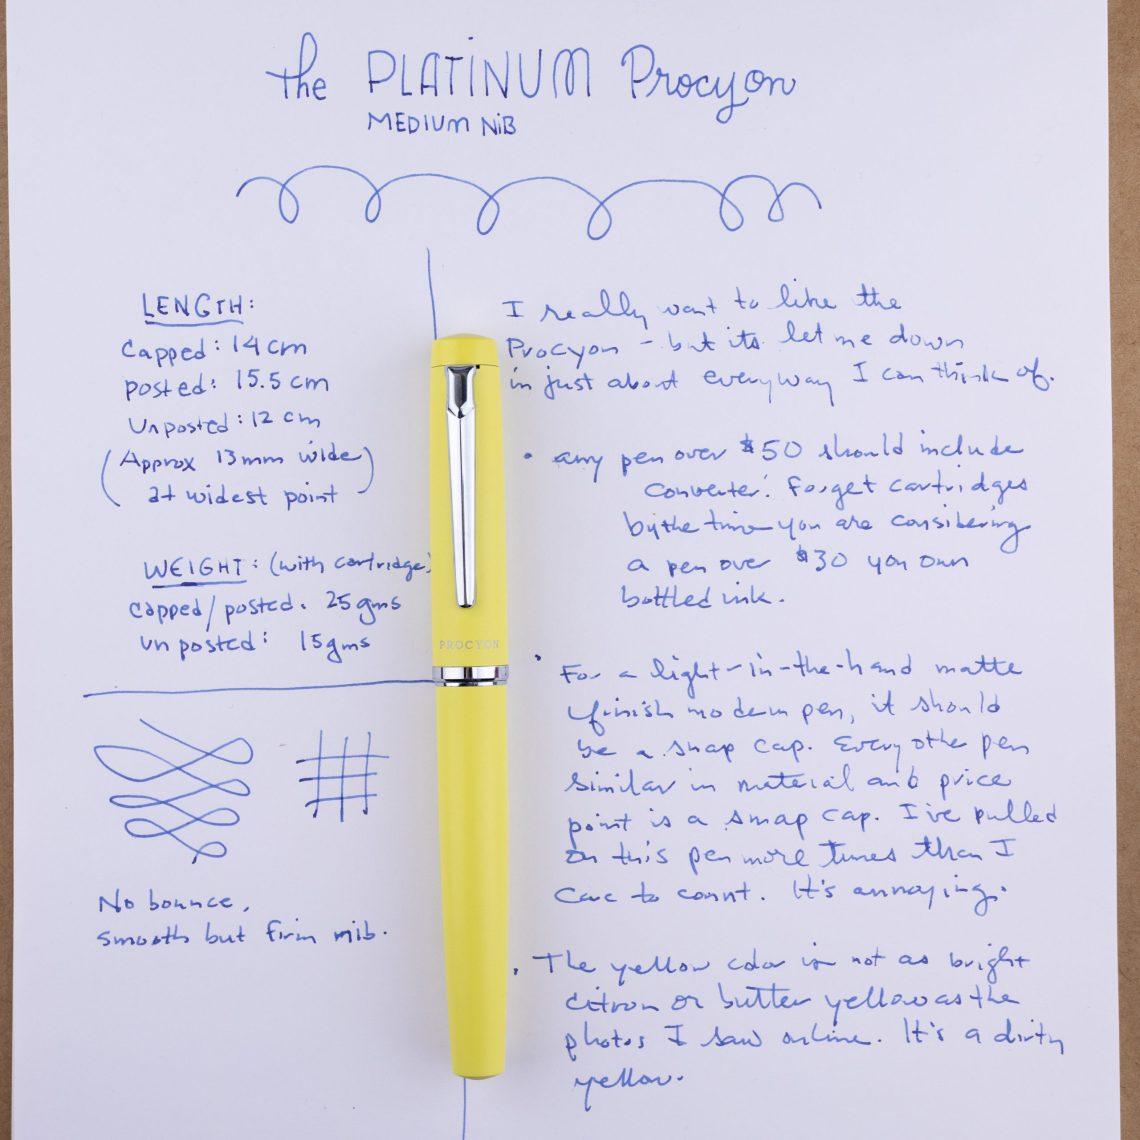 Platinum Procyon Citron writing sample